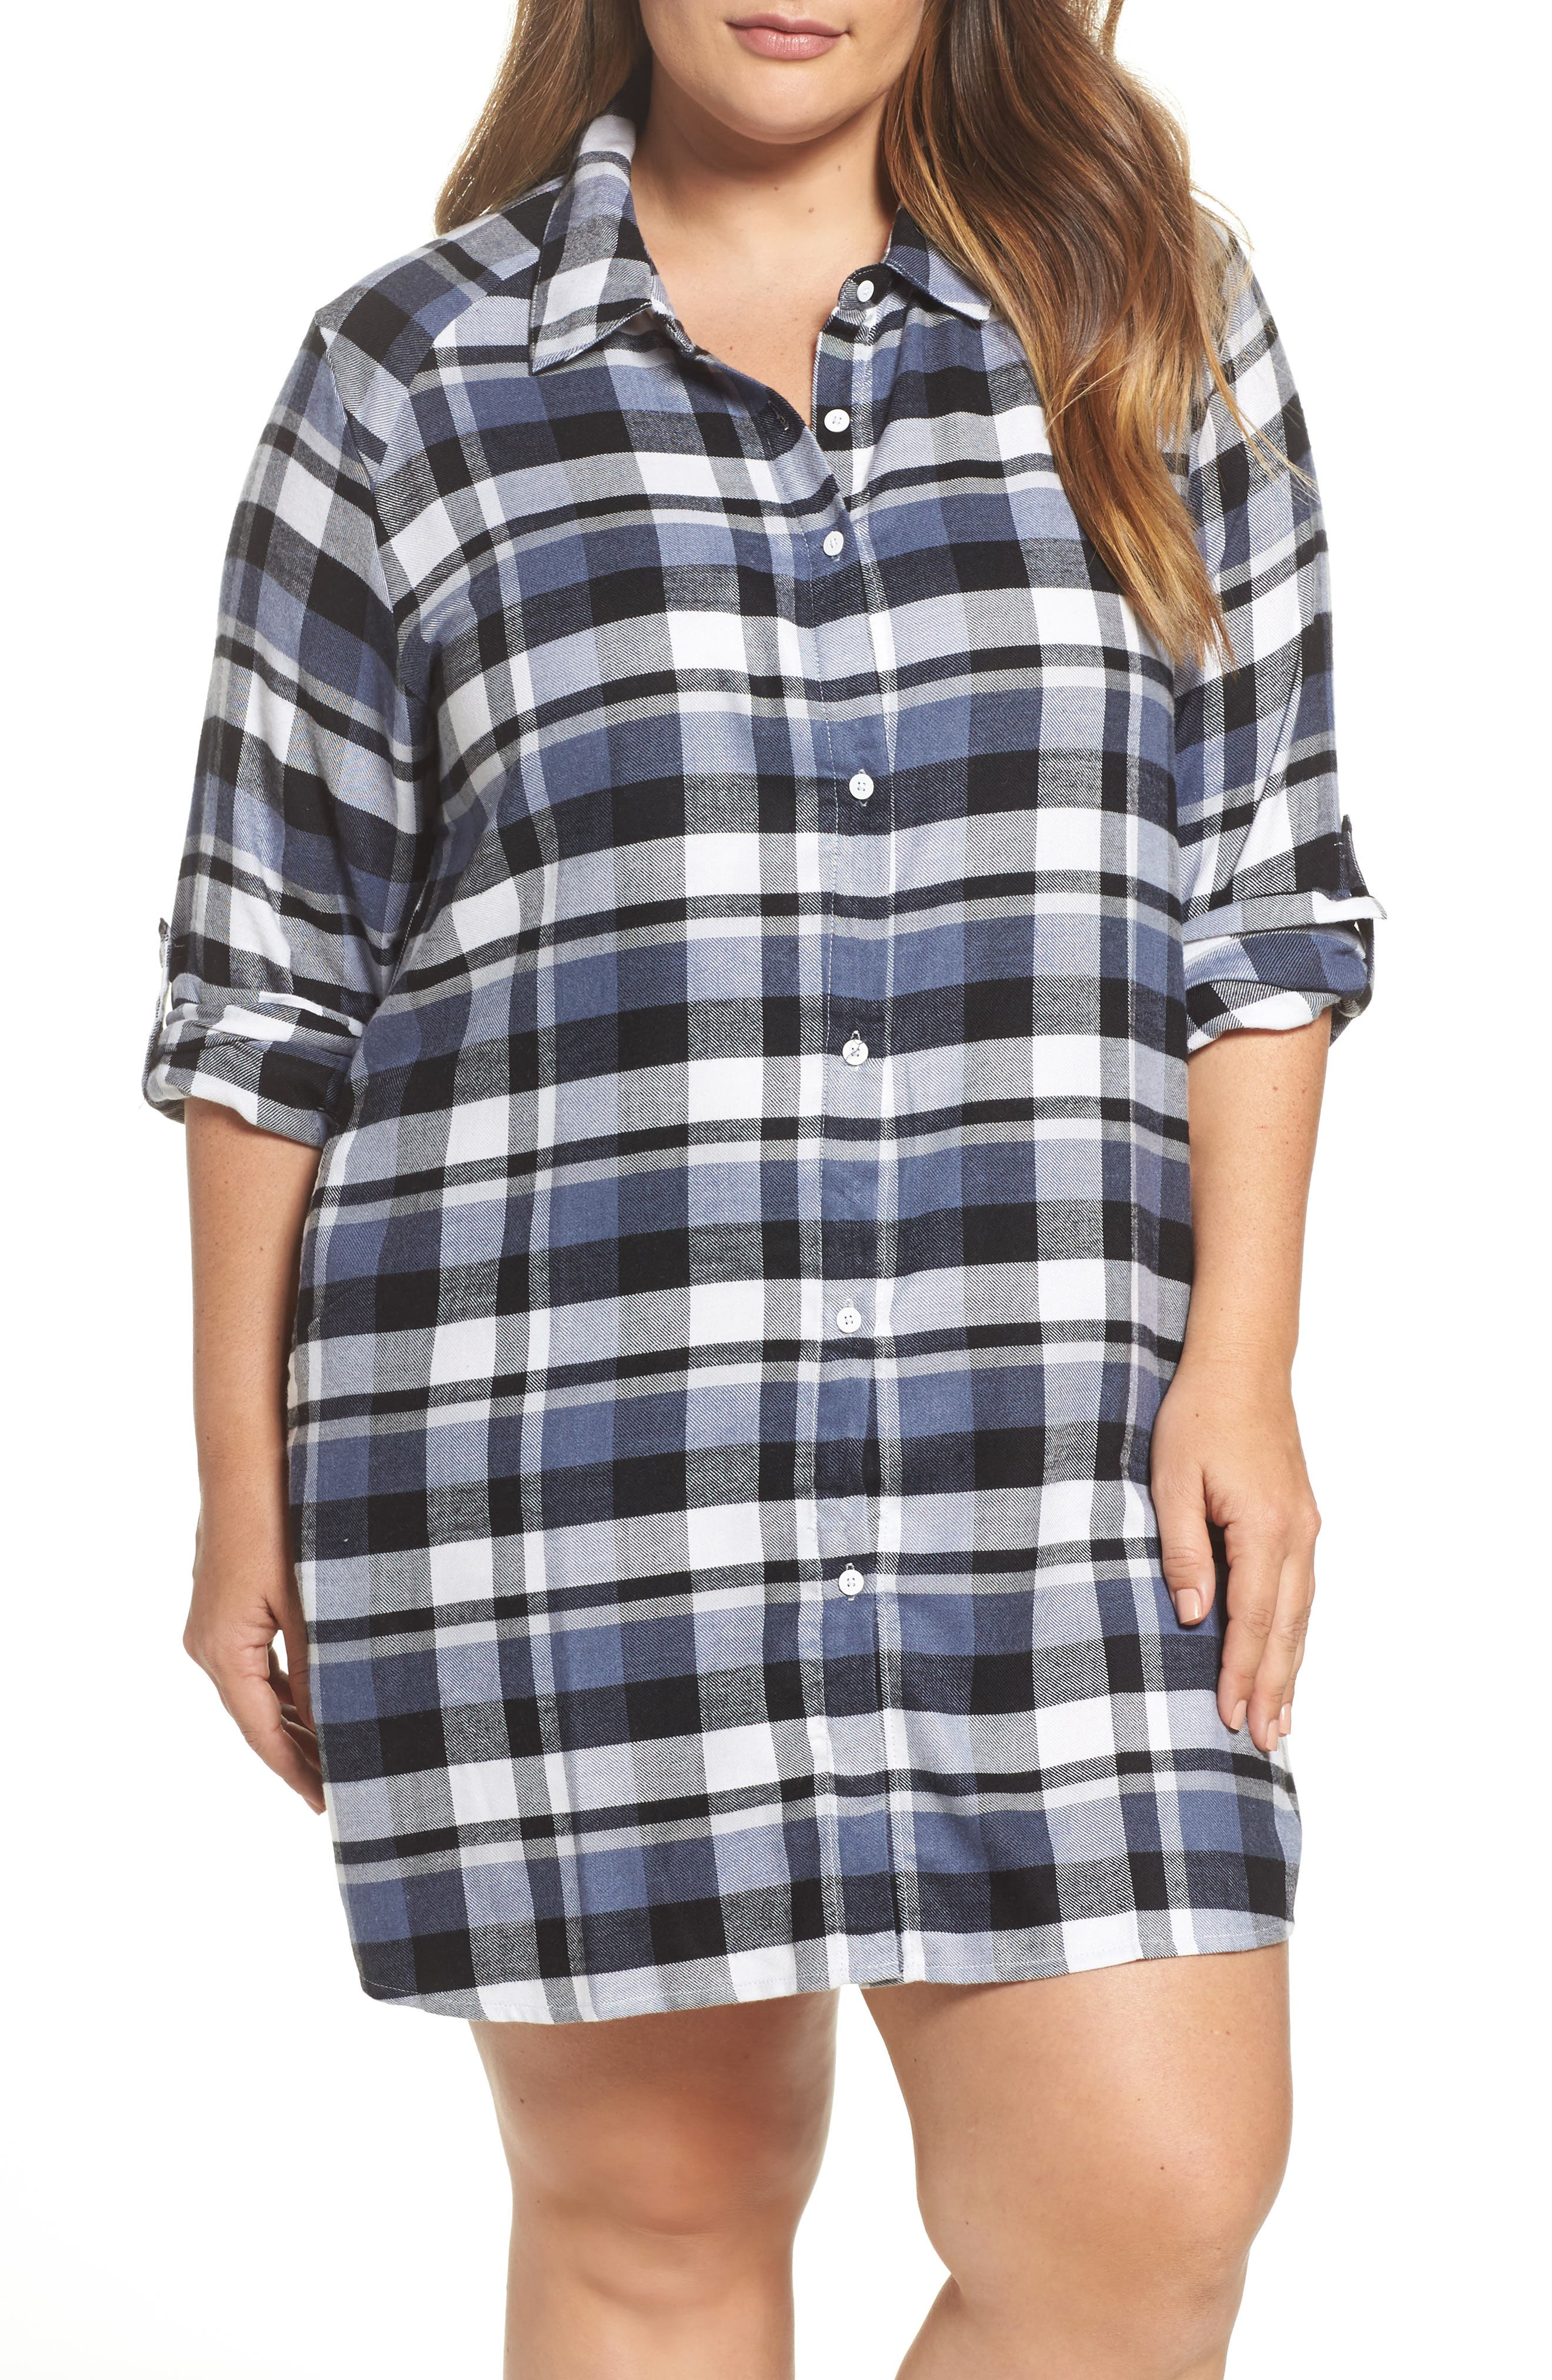 Alternate Image 1 Selected - DKNY Plaid Sleep Shirt (Plus Size)